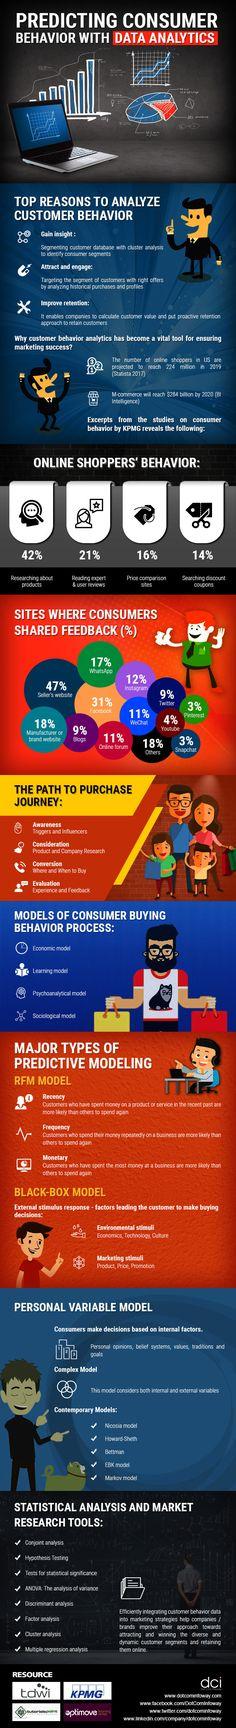 Infographic: Predicting Consumer Behavior with Data Analytics - Dot Com Infoway Customer Behaviour, Consumer Behaviour, Behavioral Economics, Business Intelligence, Data Analytics, Futurism, Counselling, Data Science, Customer Experience